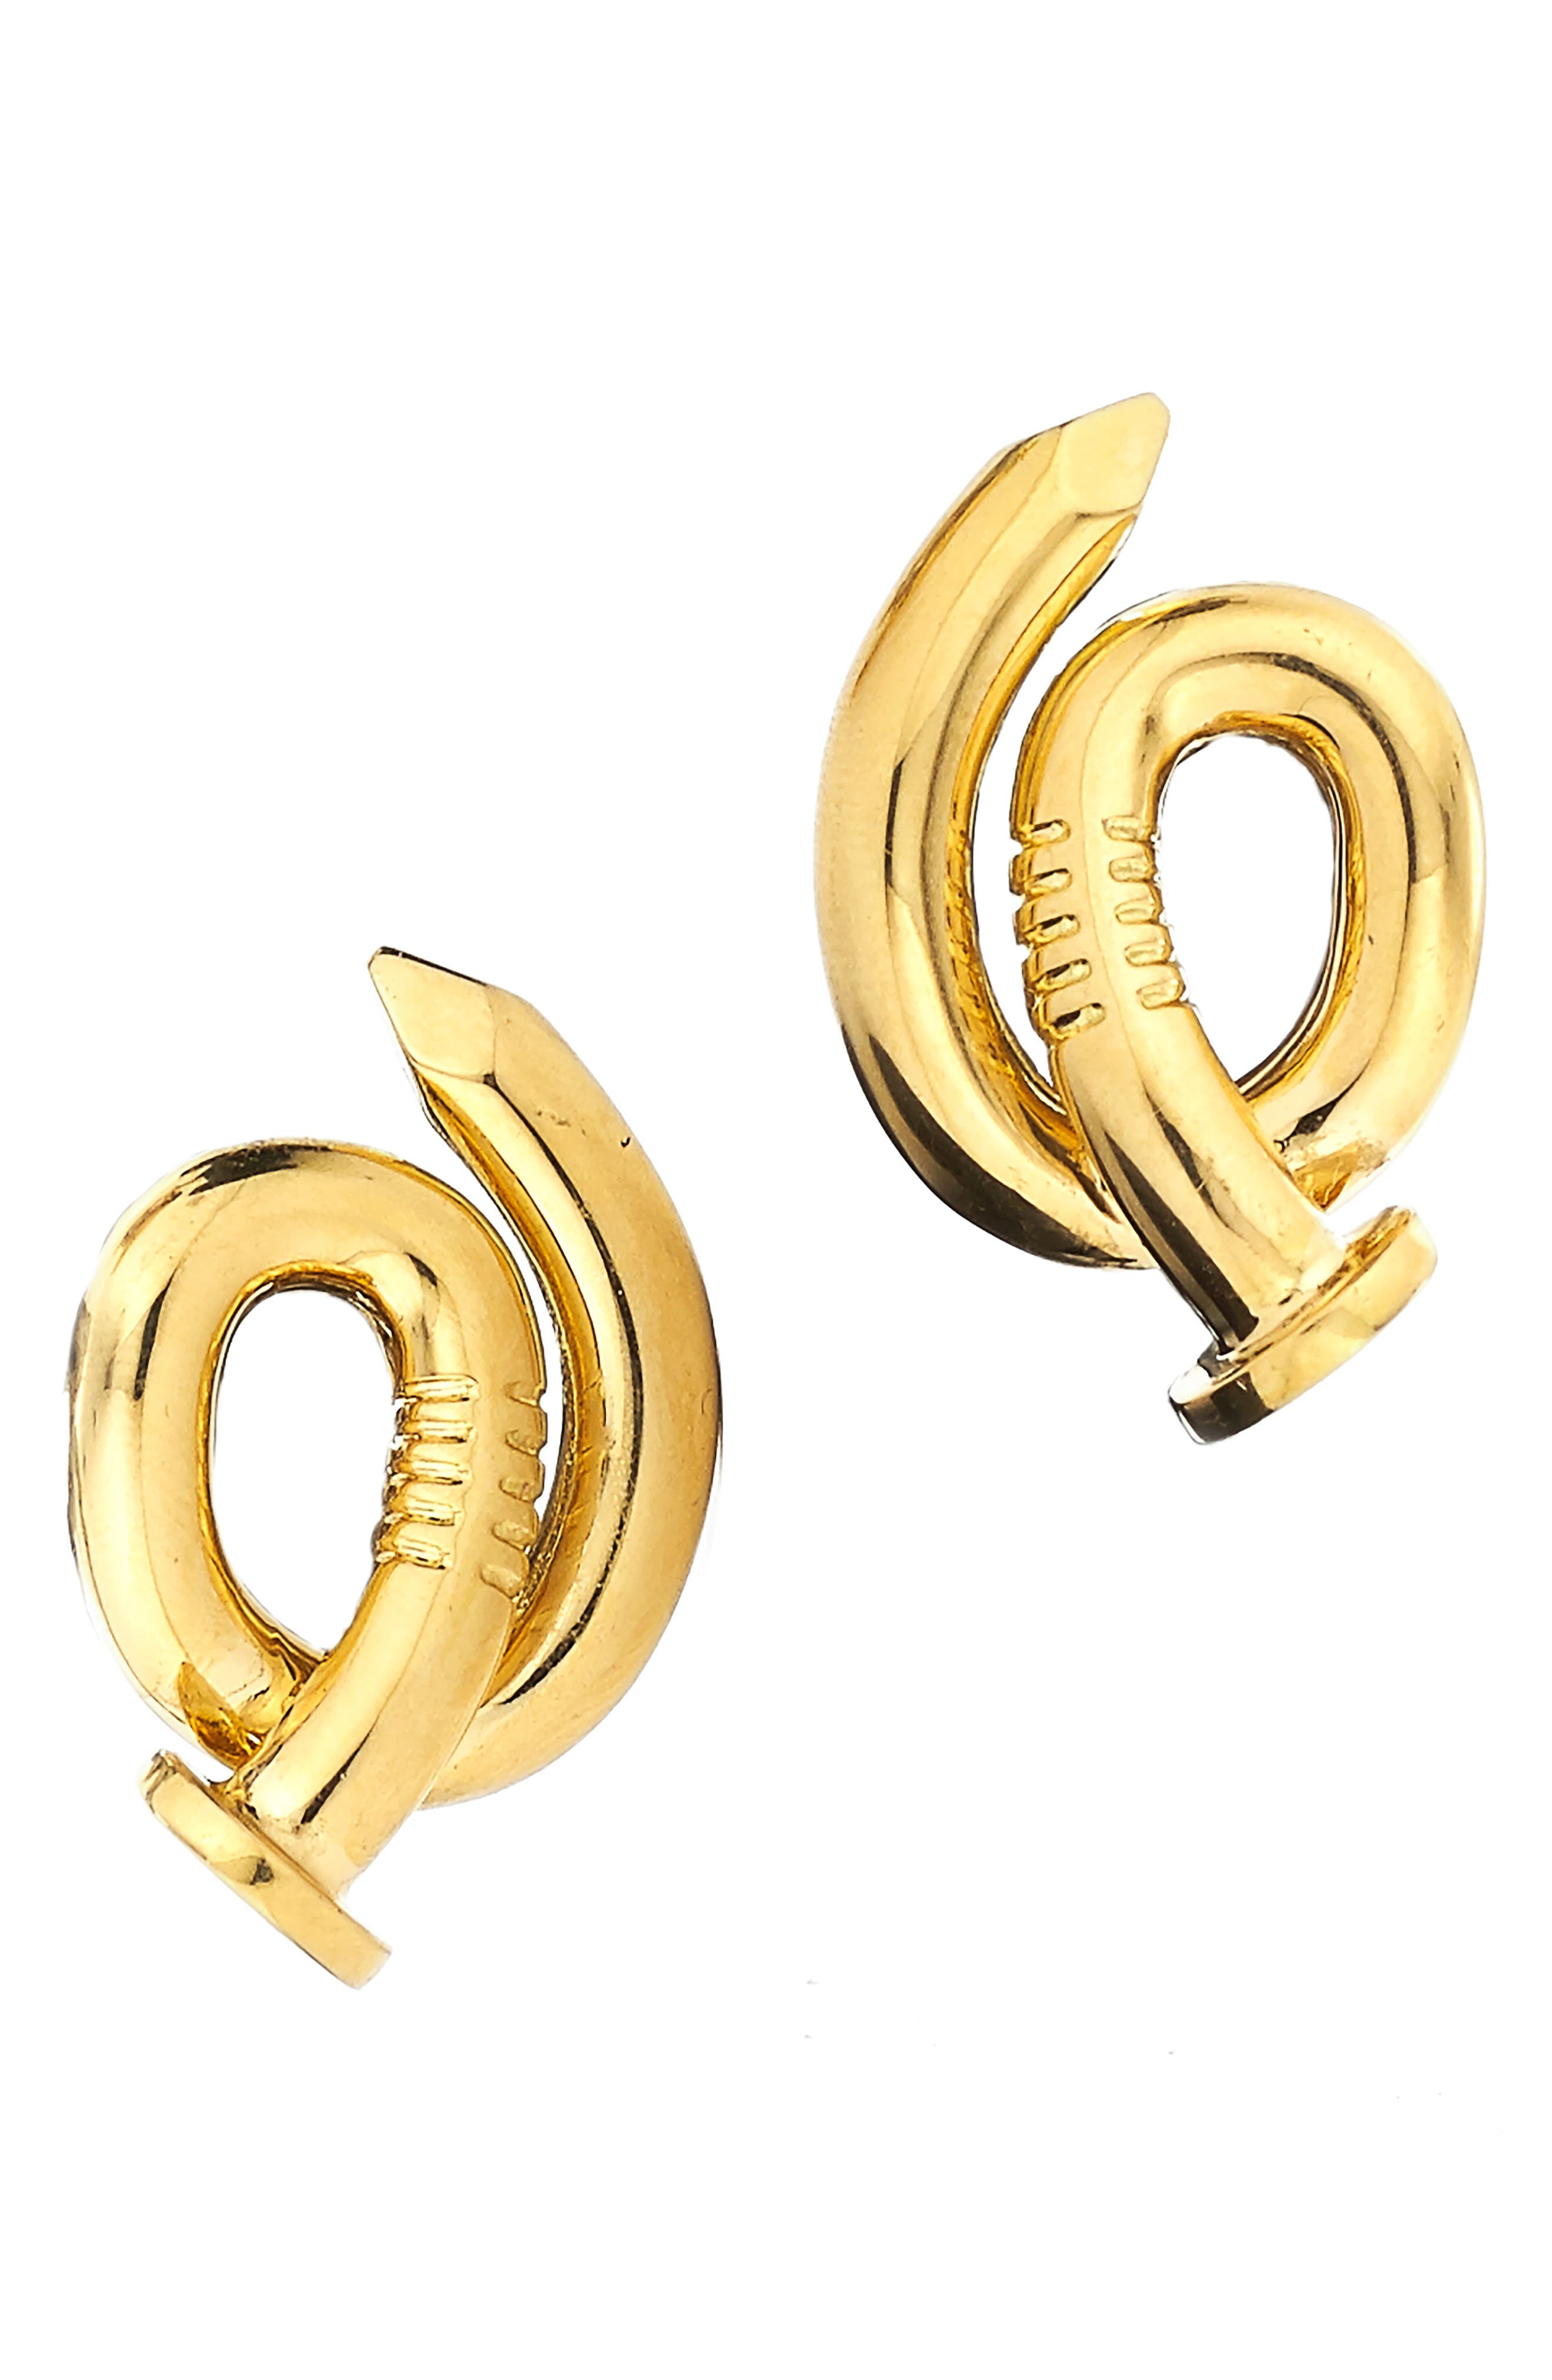 Bent Nail Earrings